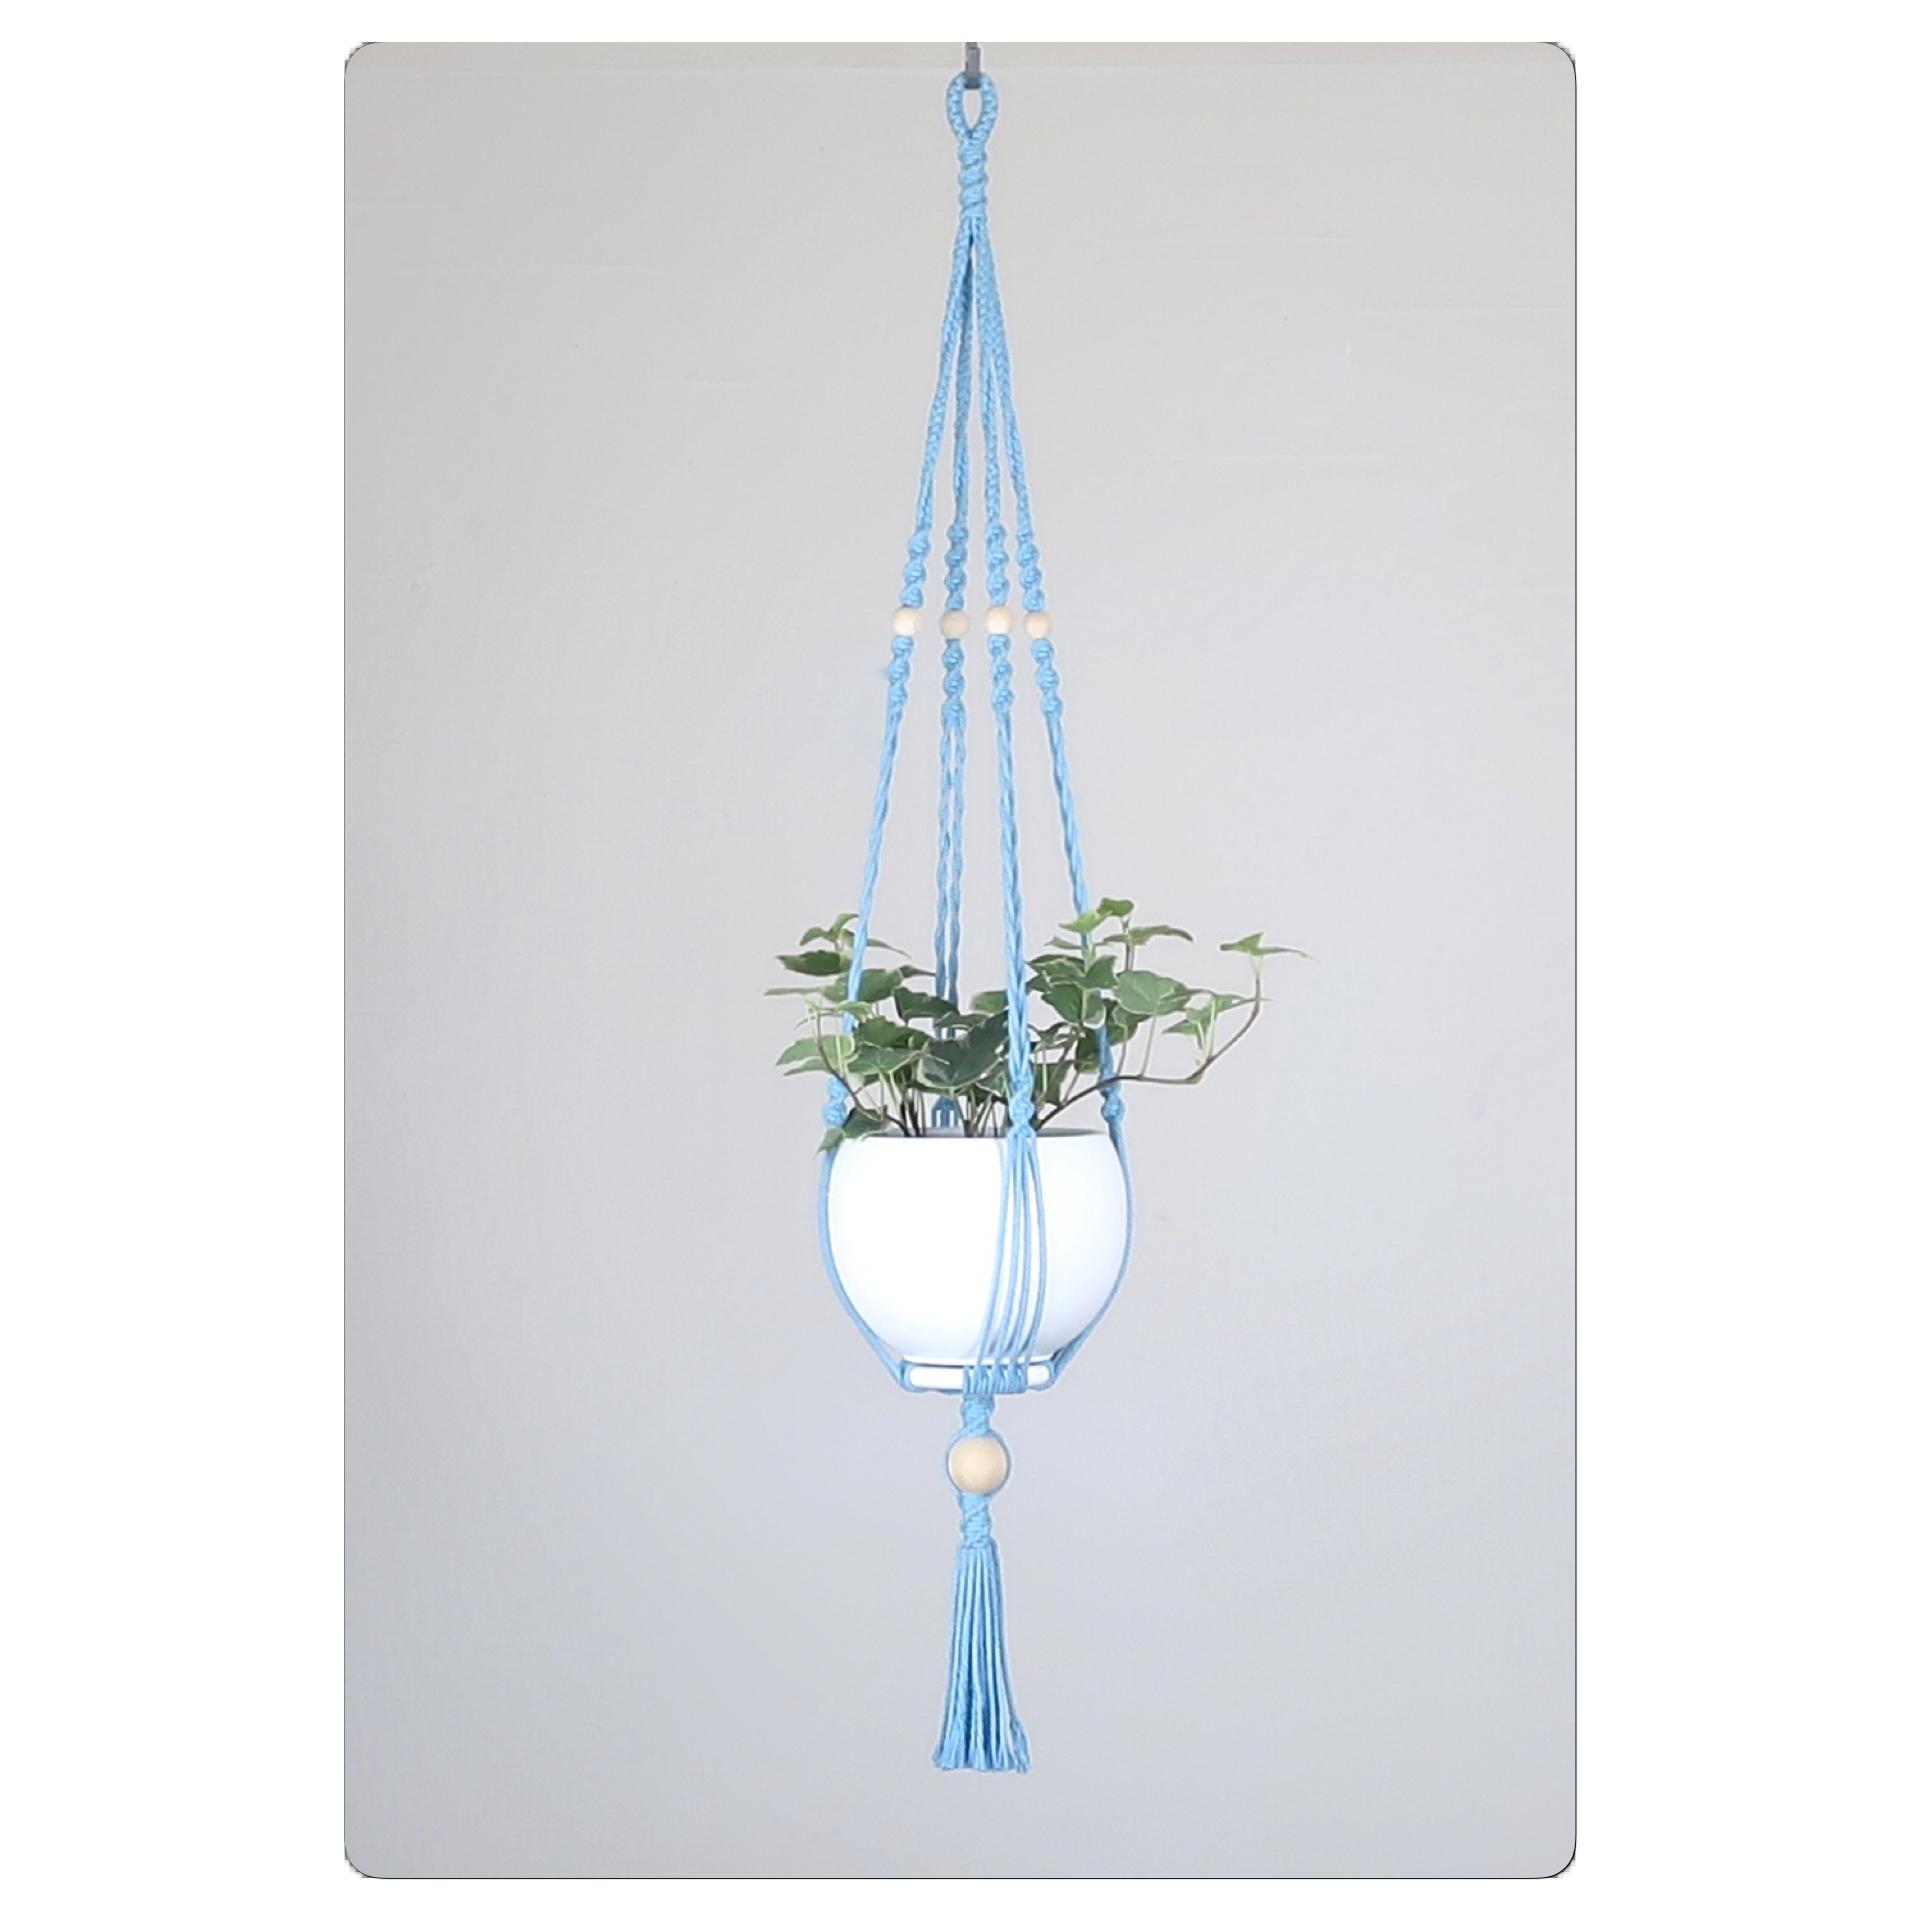 suspension macram pour plante bymadjo shou d co. Black Bedroom Furniture Sets. Home Design Ideas